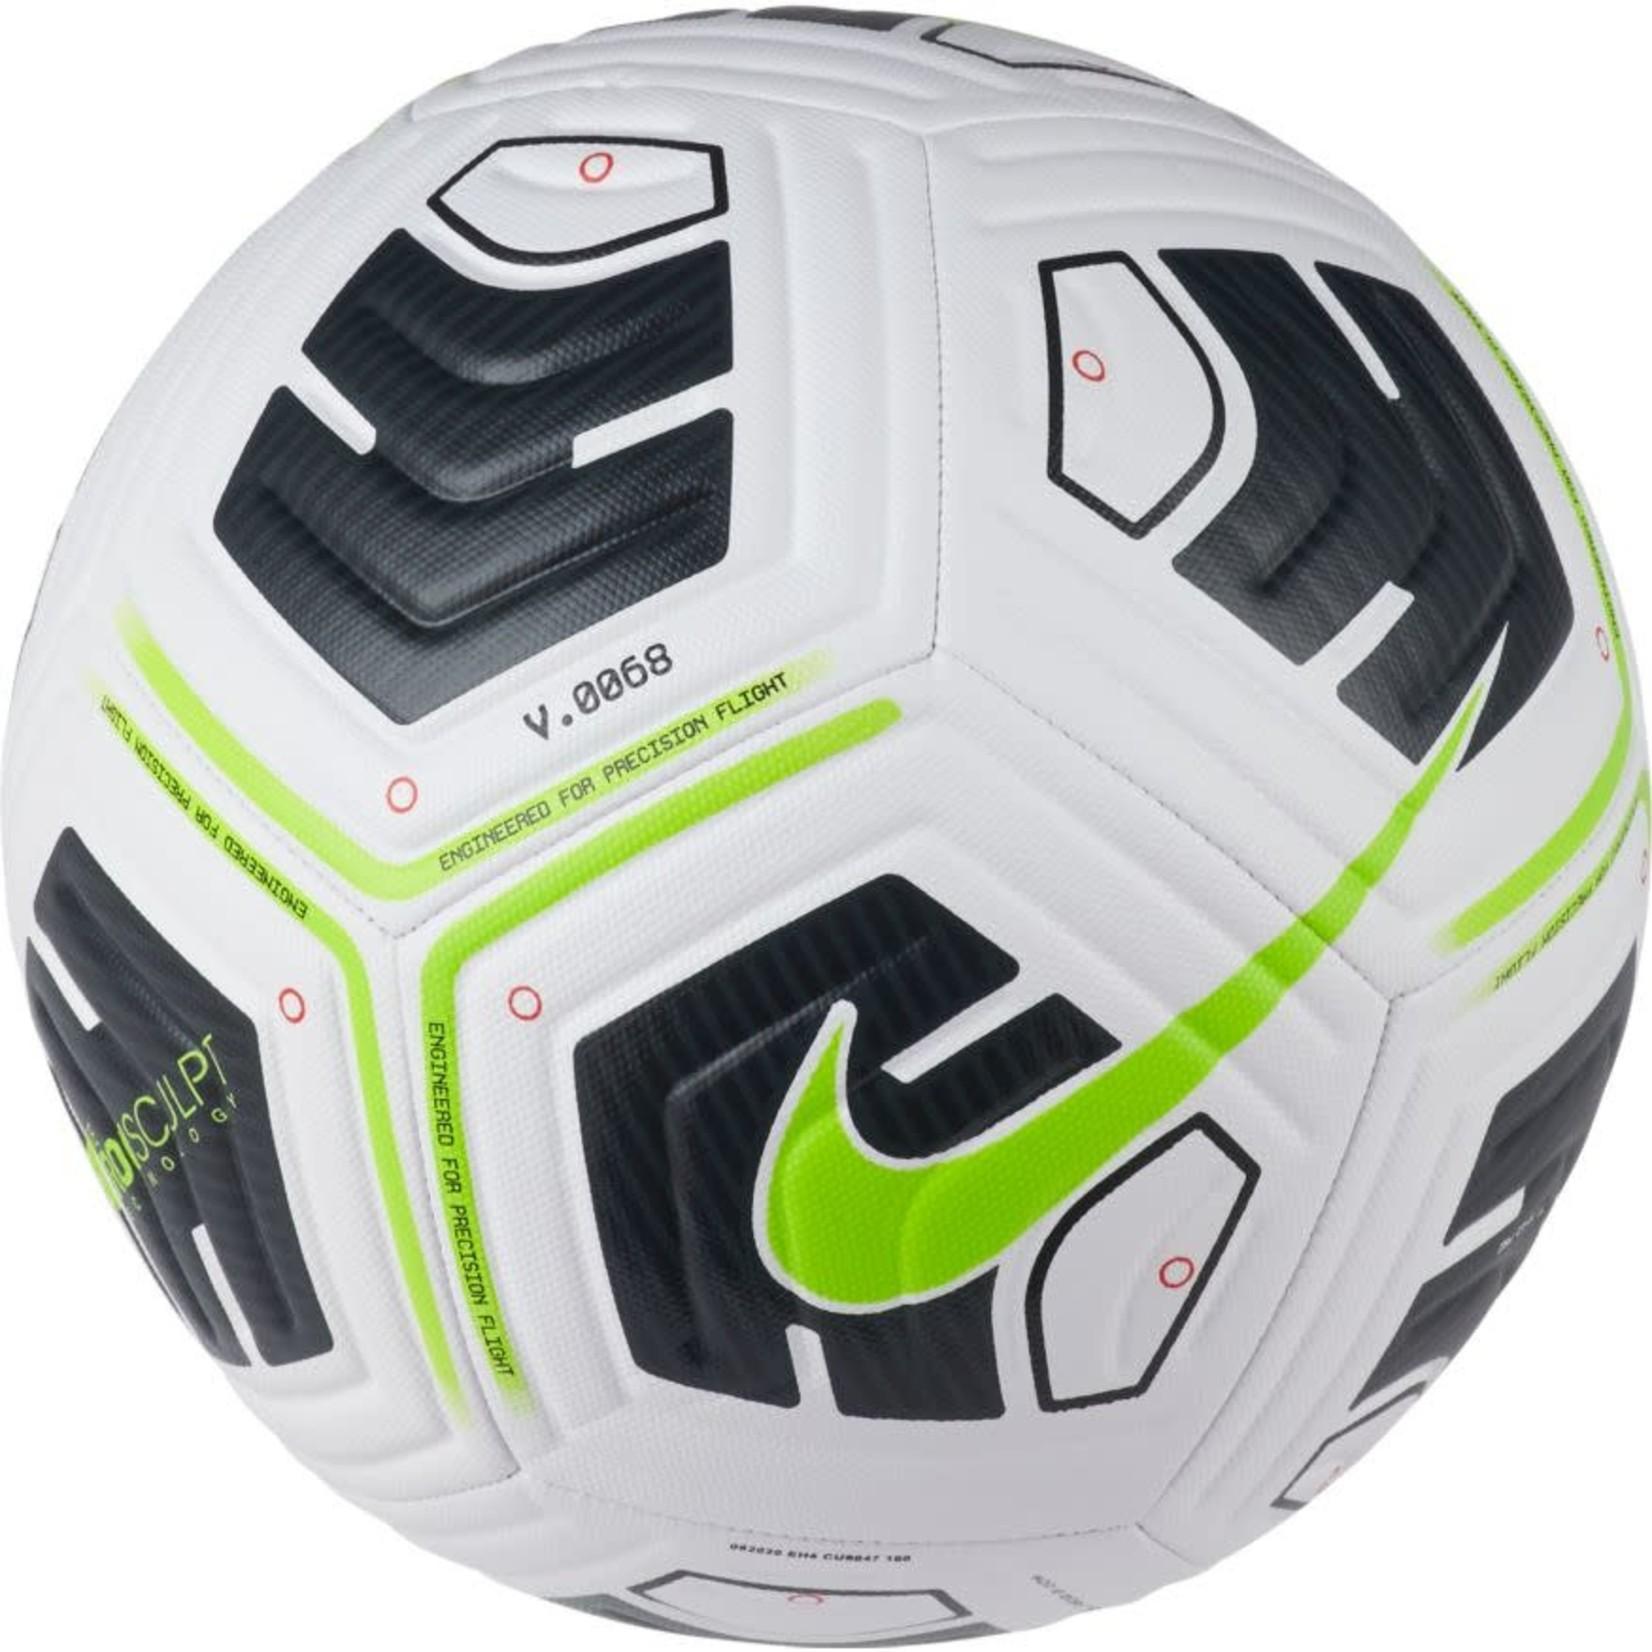 NIKE ACADEMY TEAM BALL (WHITE/BLACK/VOLT)